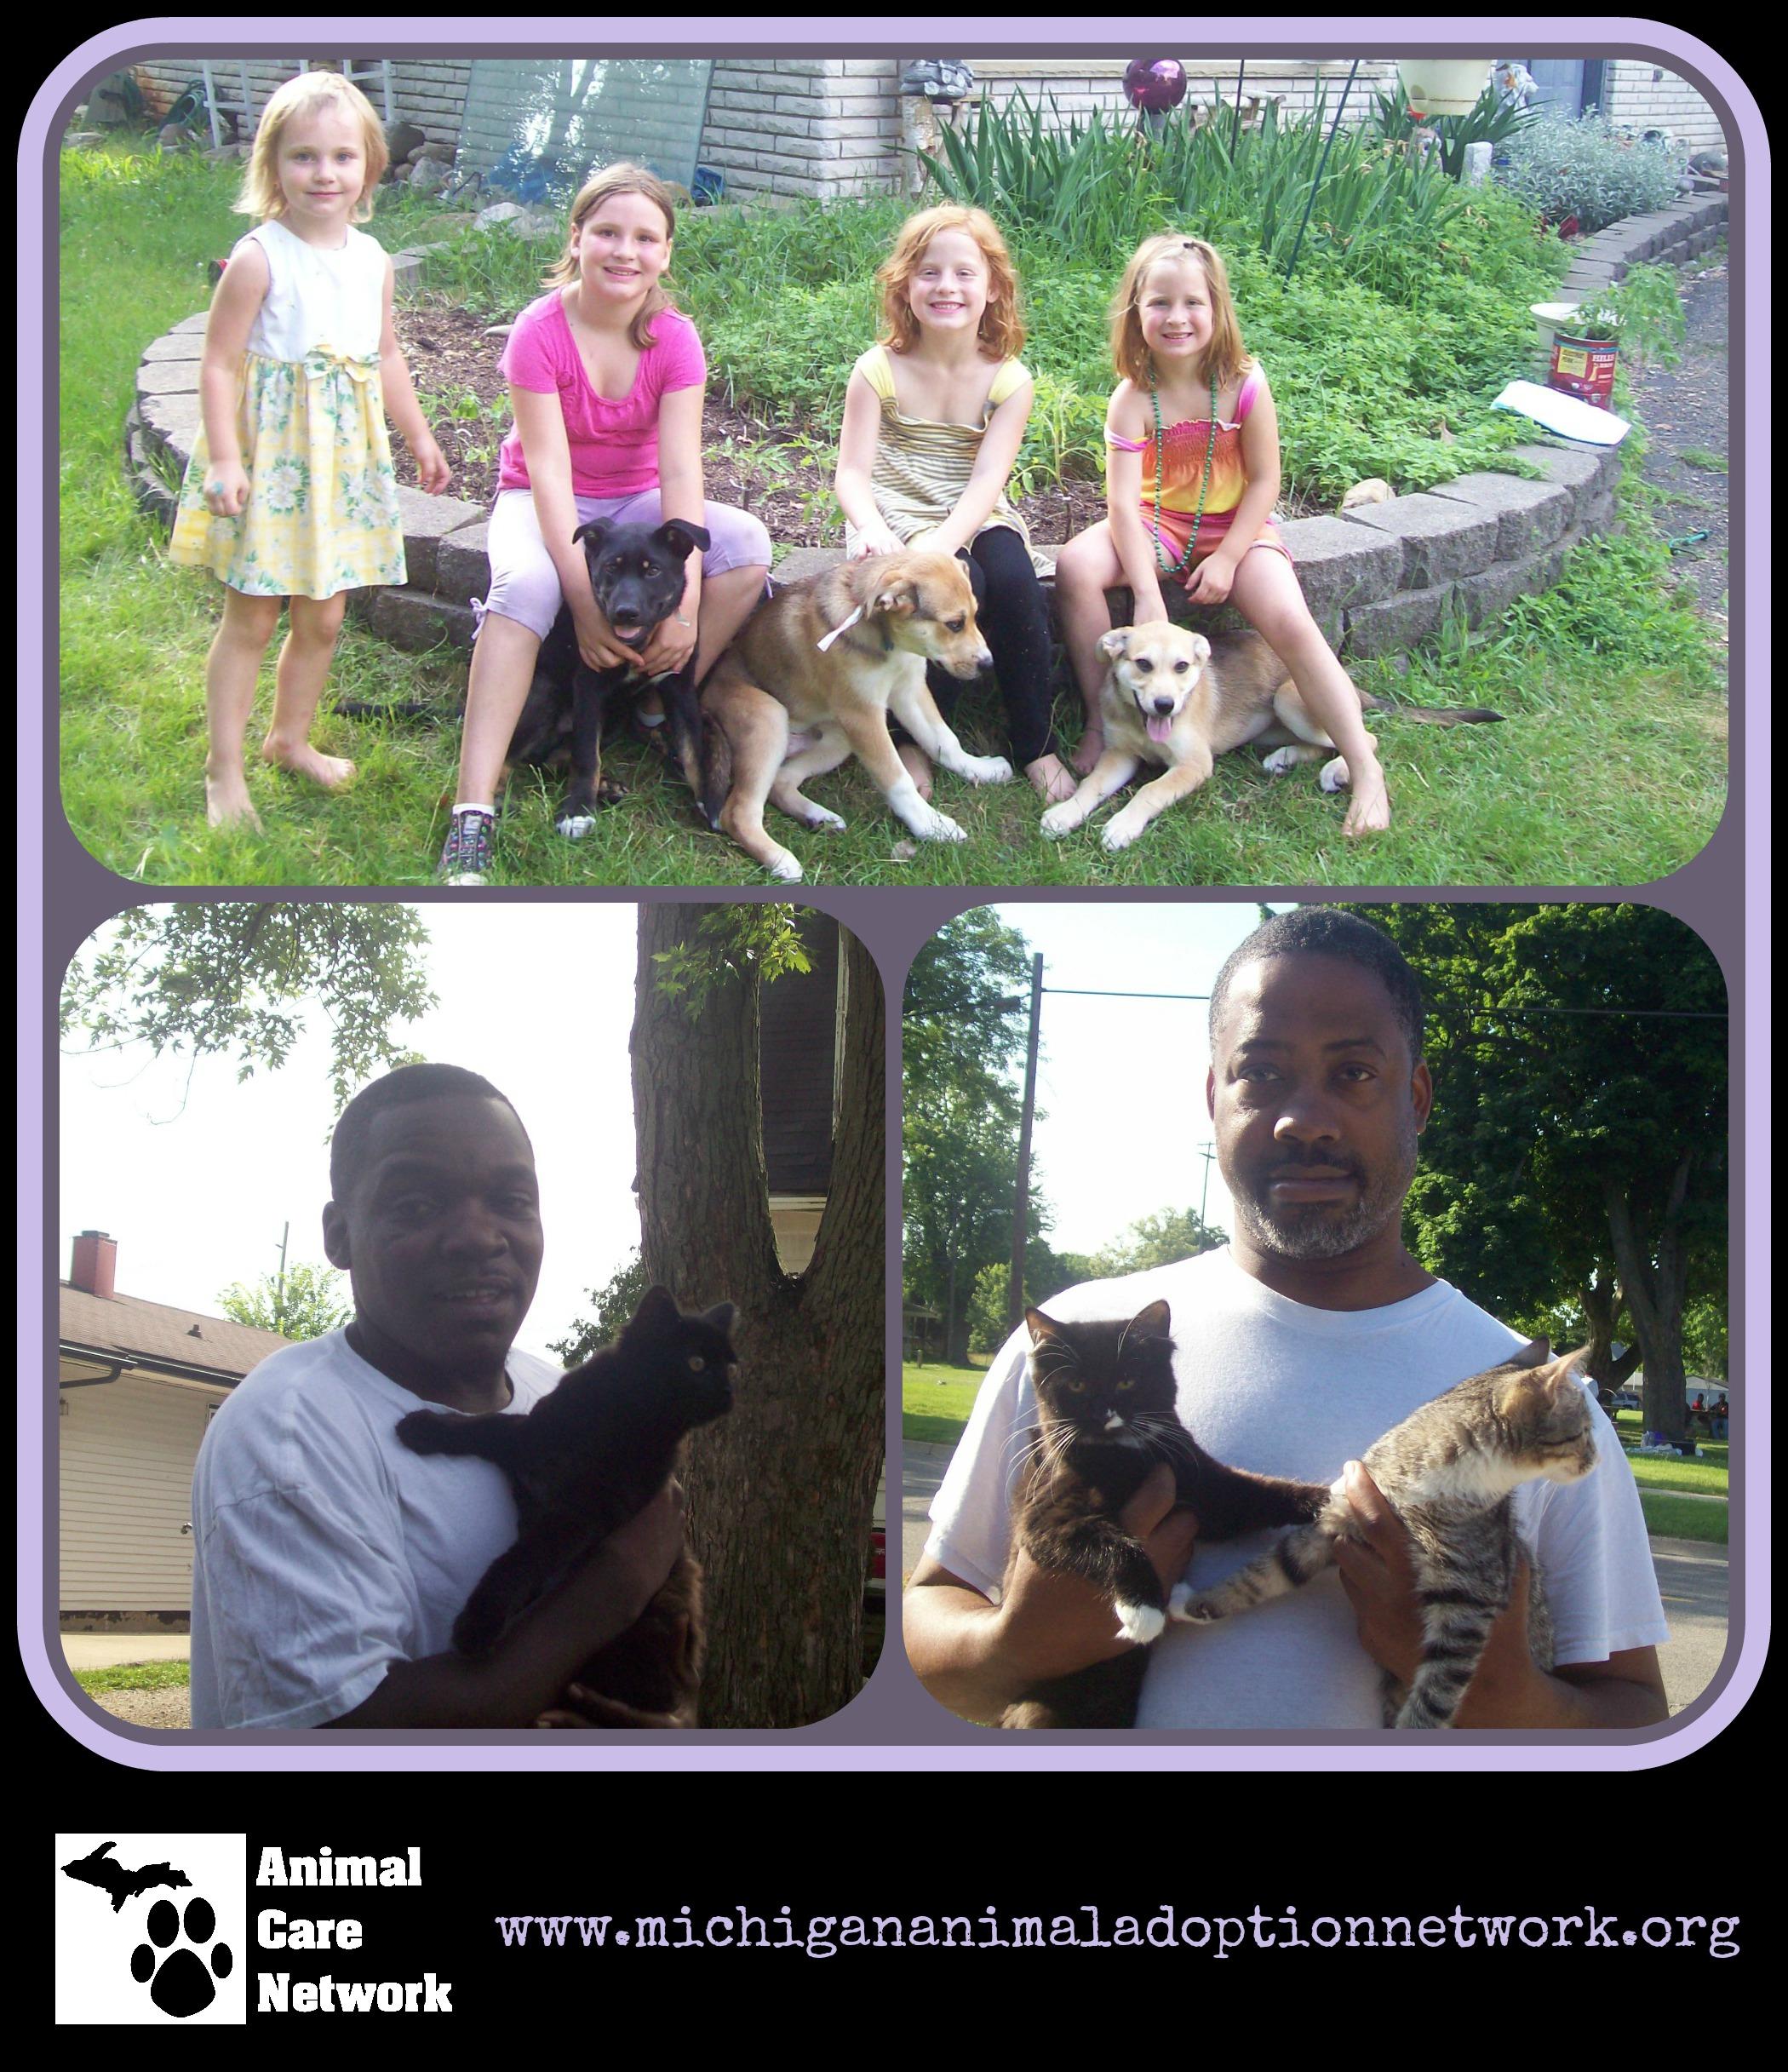 July 5 2013 PicMonkey Collage